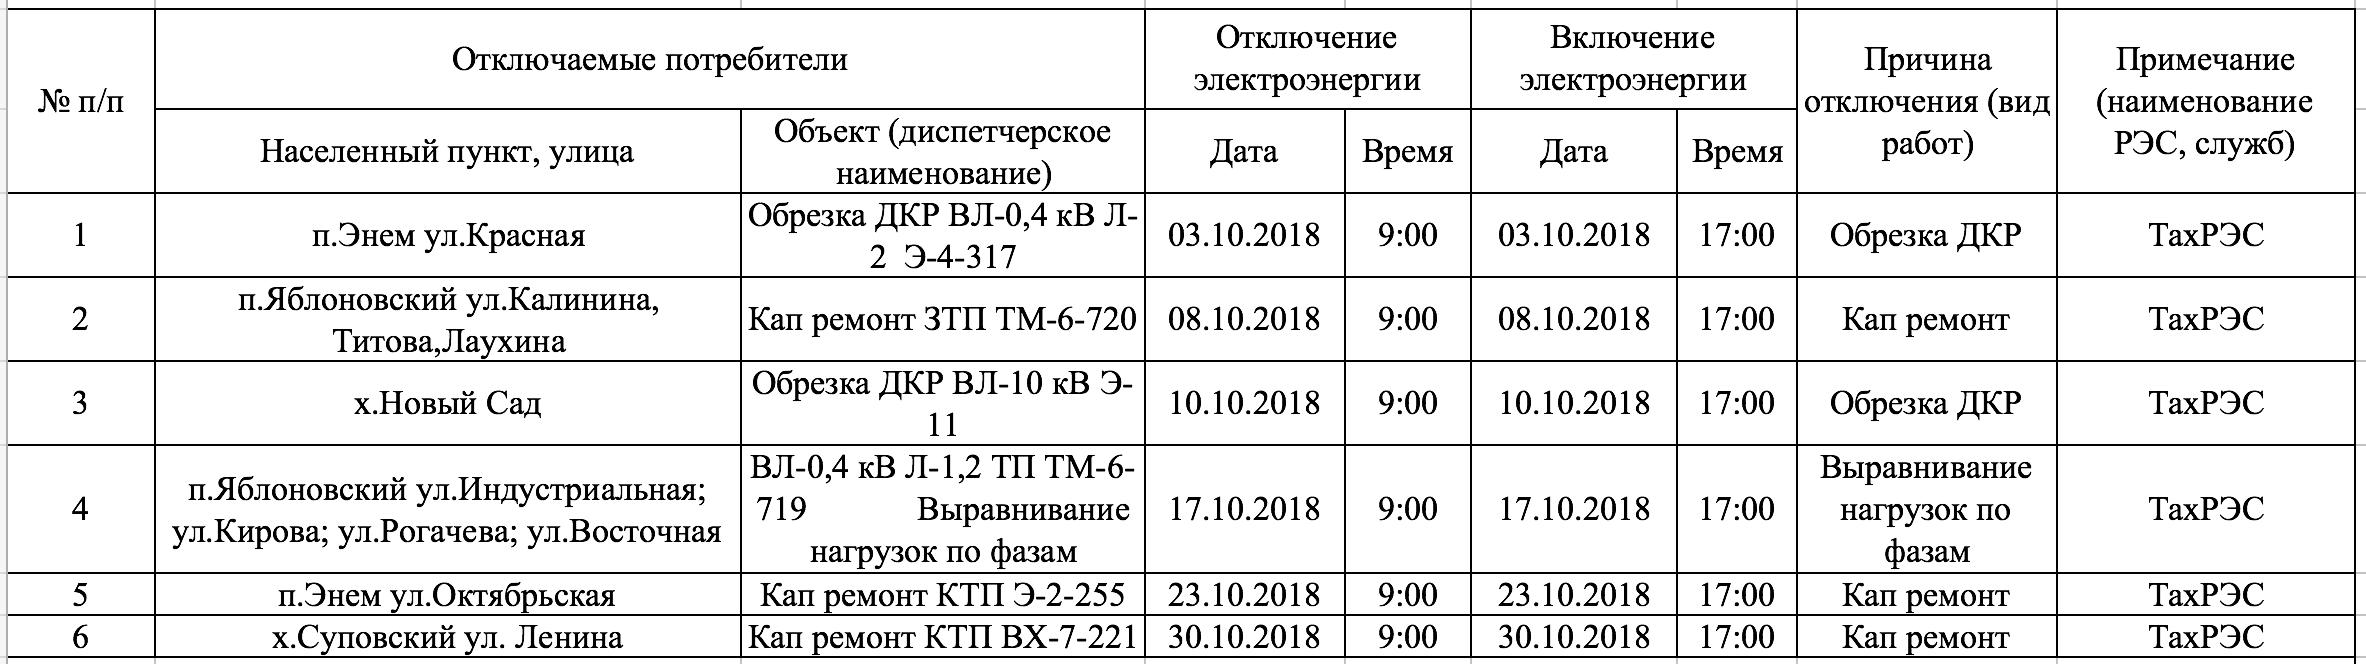 Снимок экрана 2018-10-06 в 23.52.55